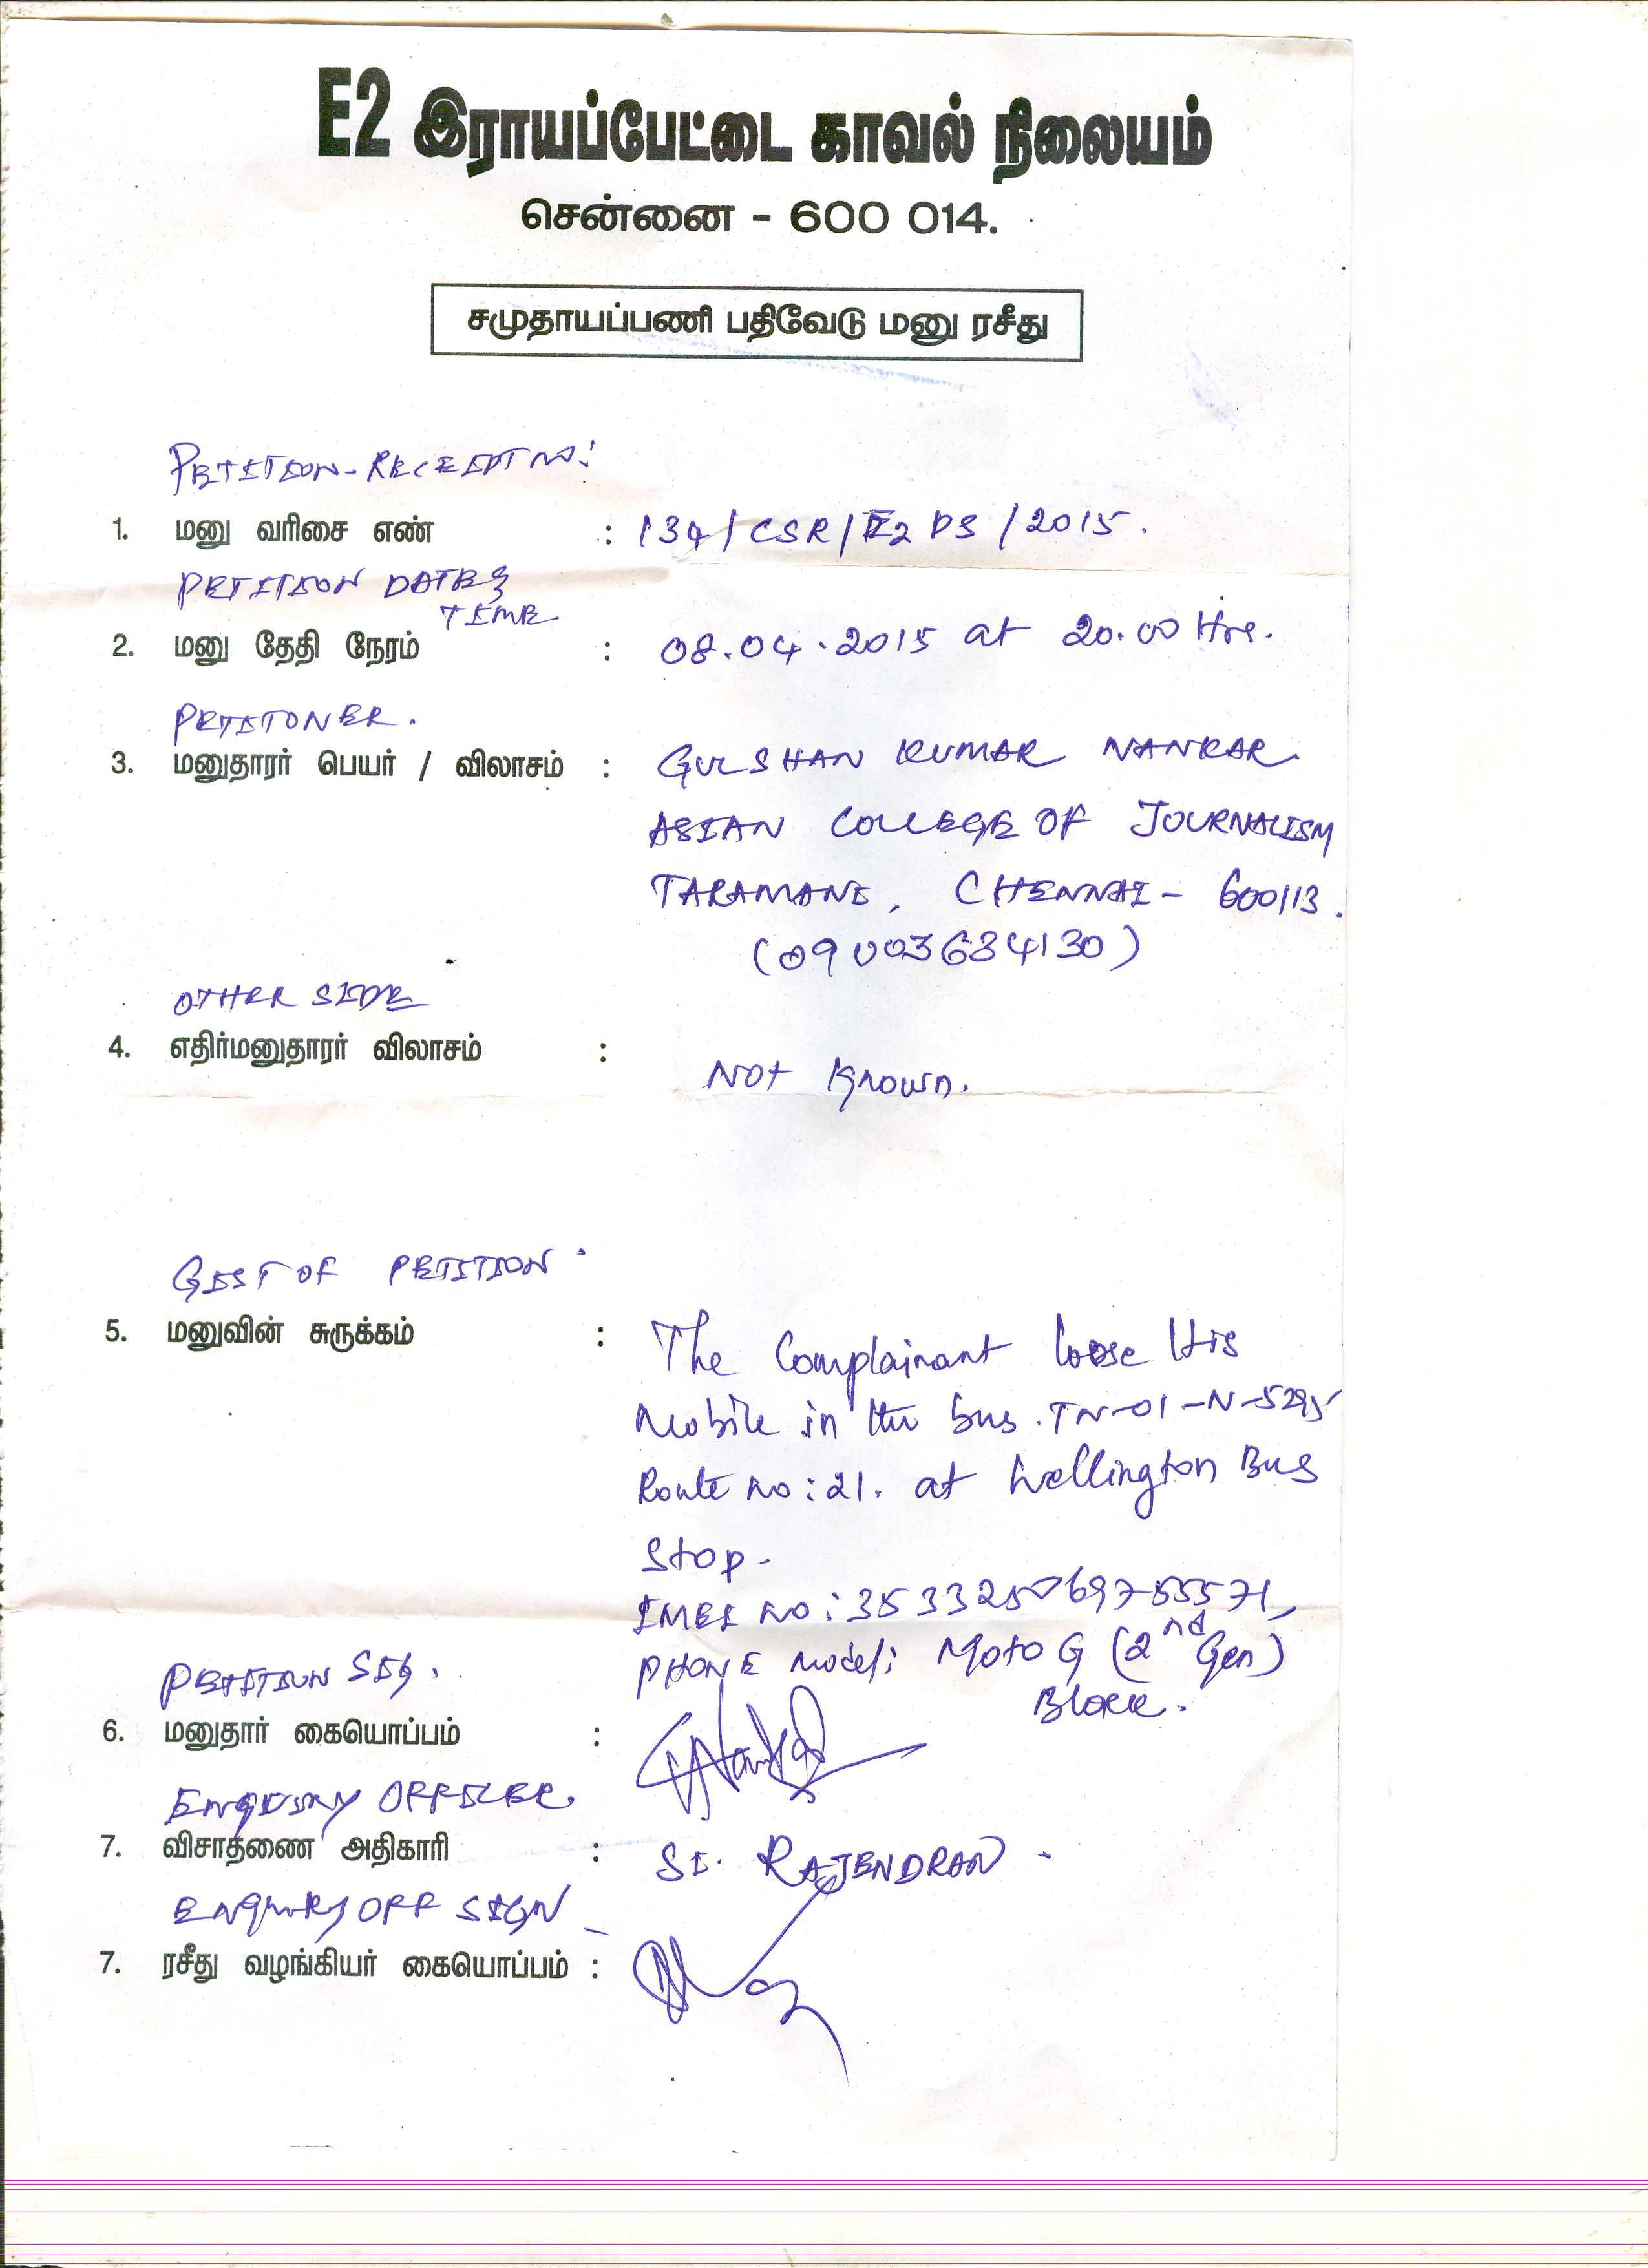 Police fir format cover letter cover letter police complaint letter format gallery samples spiritdancerdesigns Choice Image